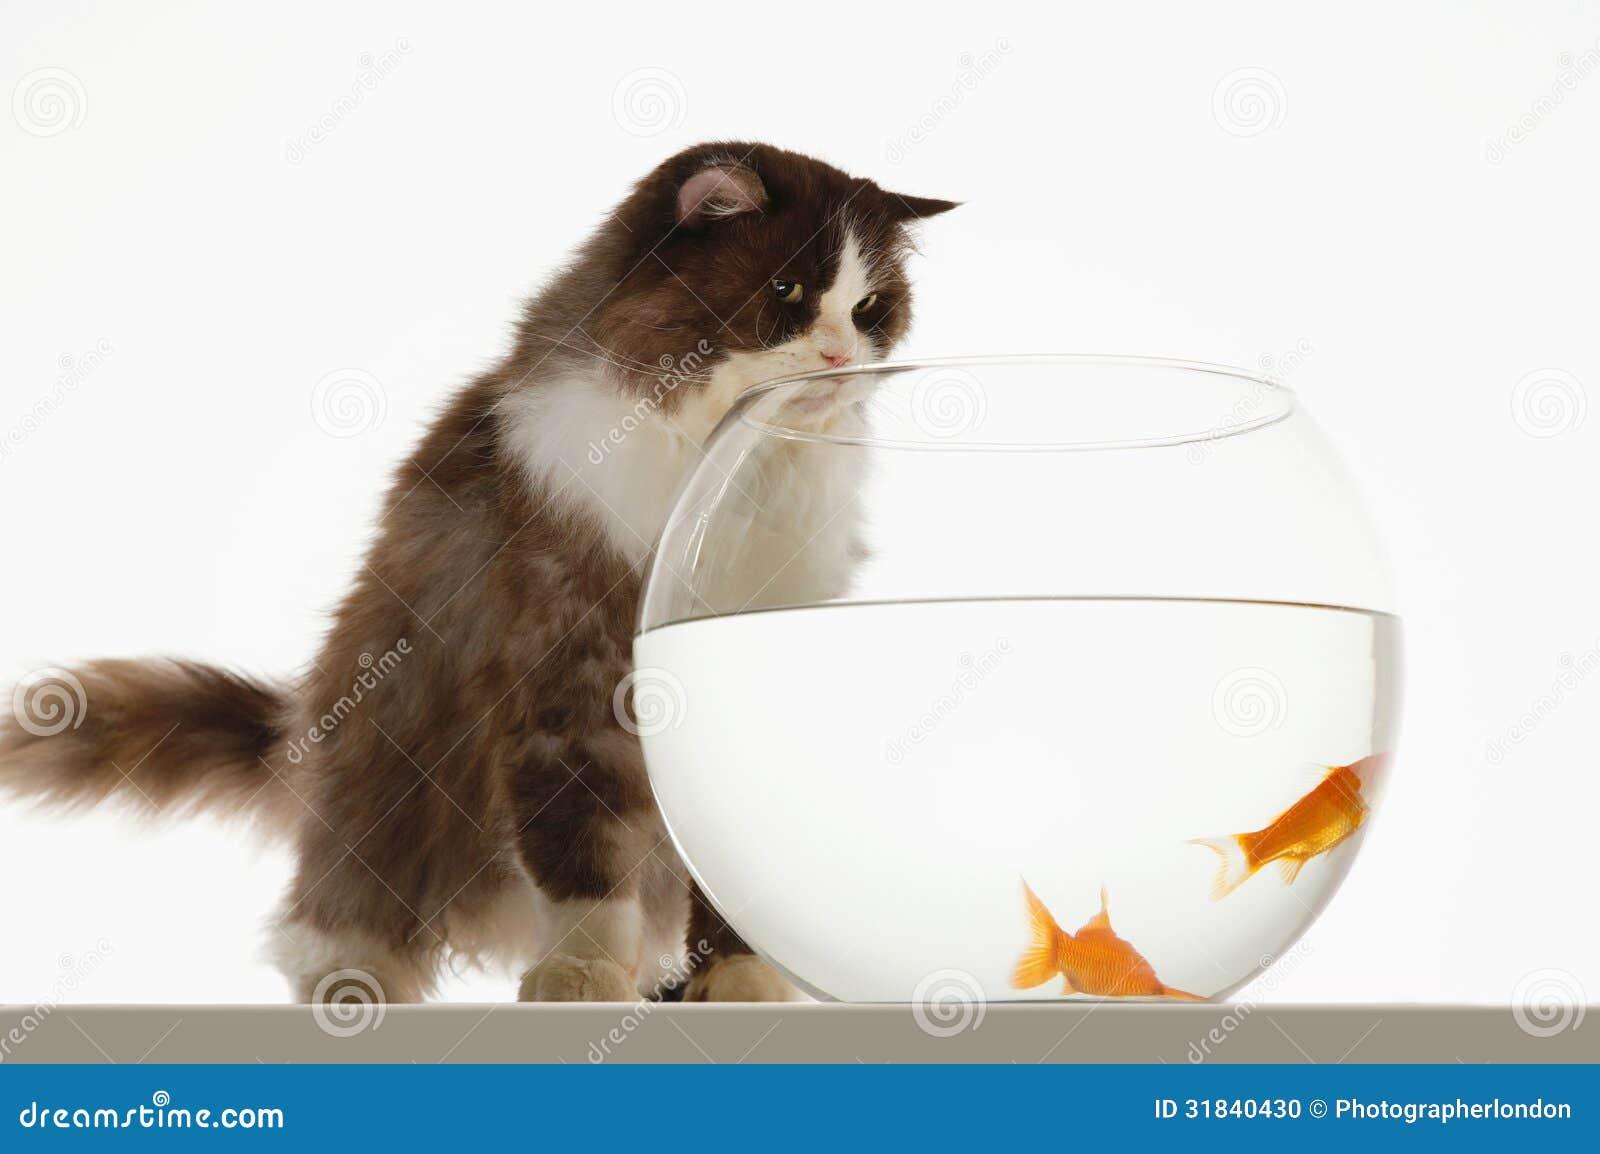 Cat In Glass Bowl Video